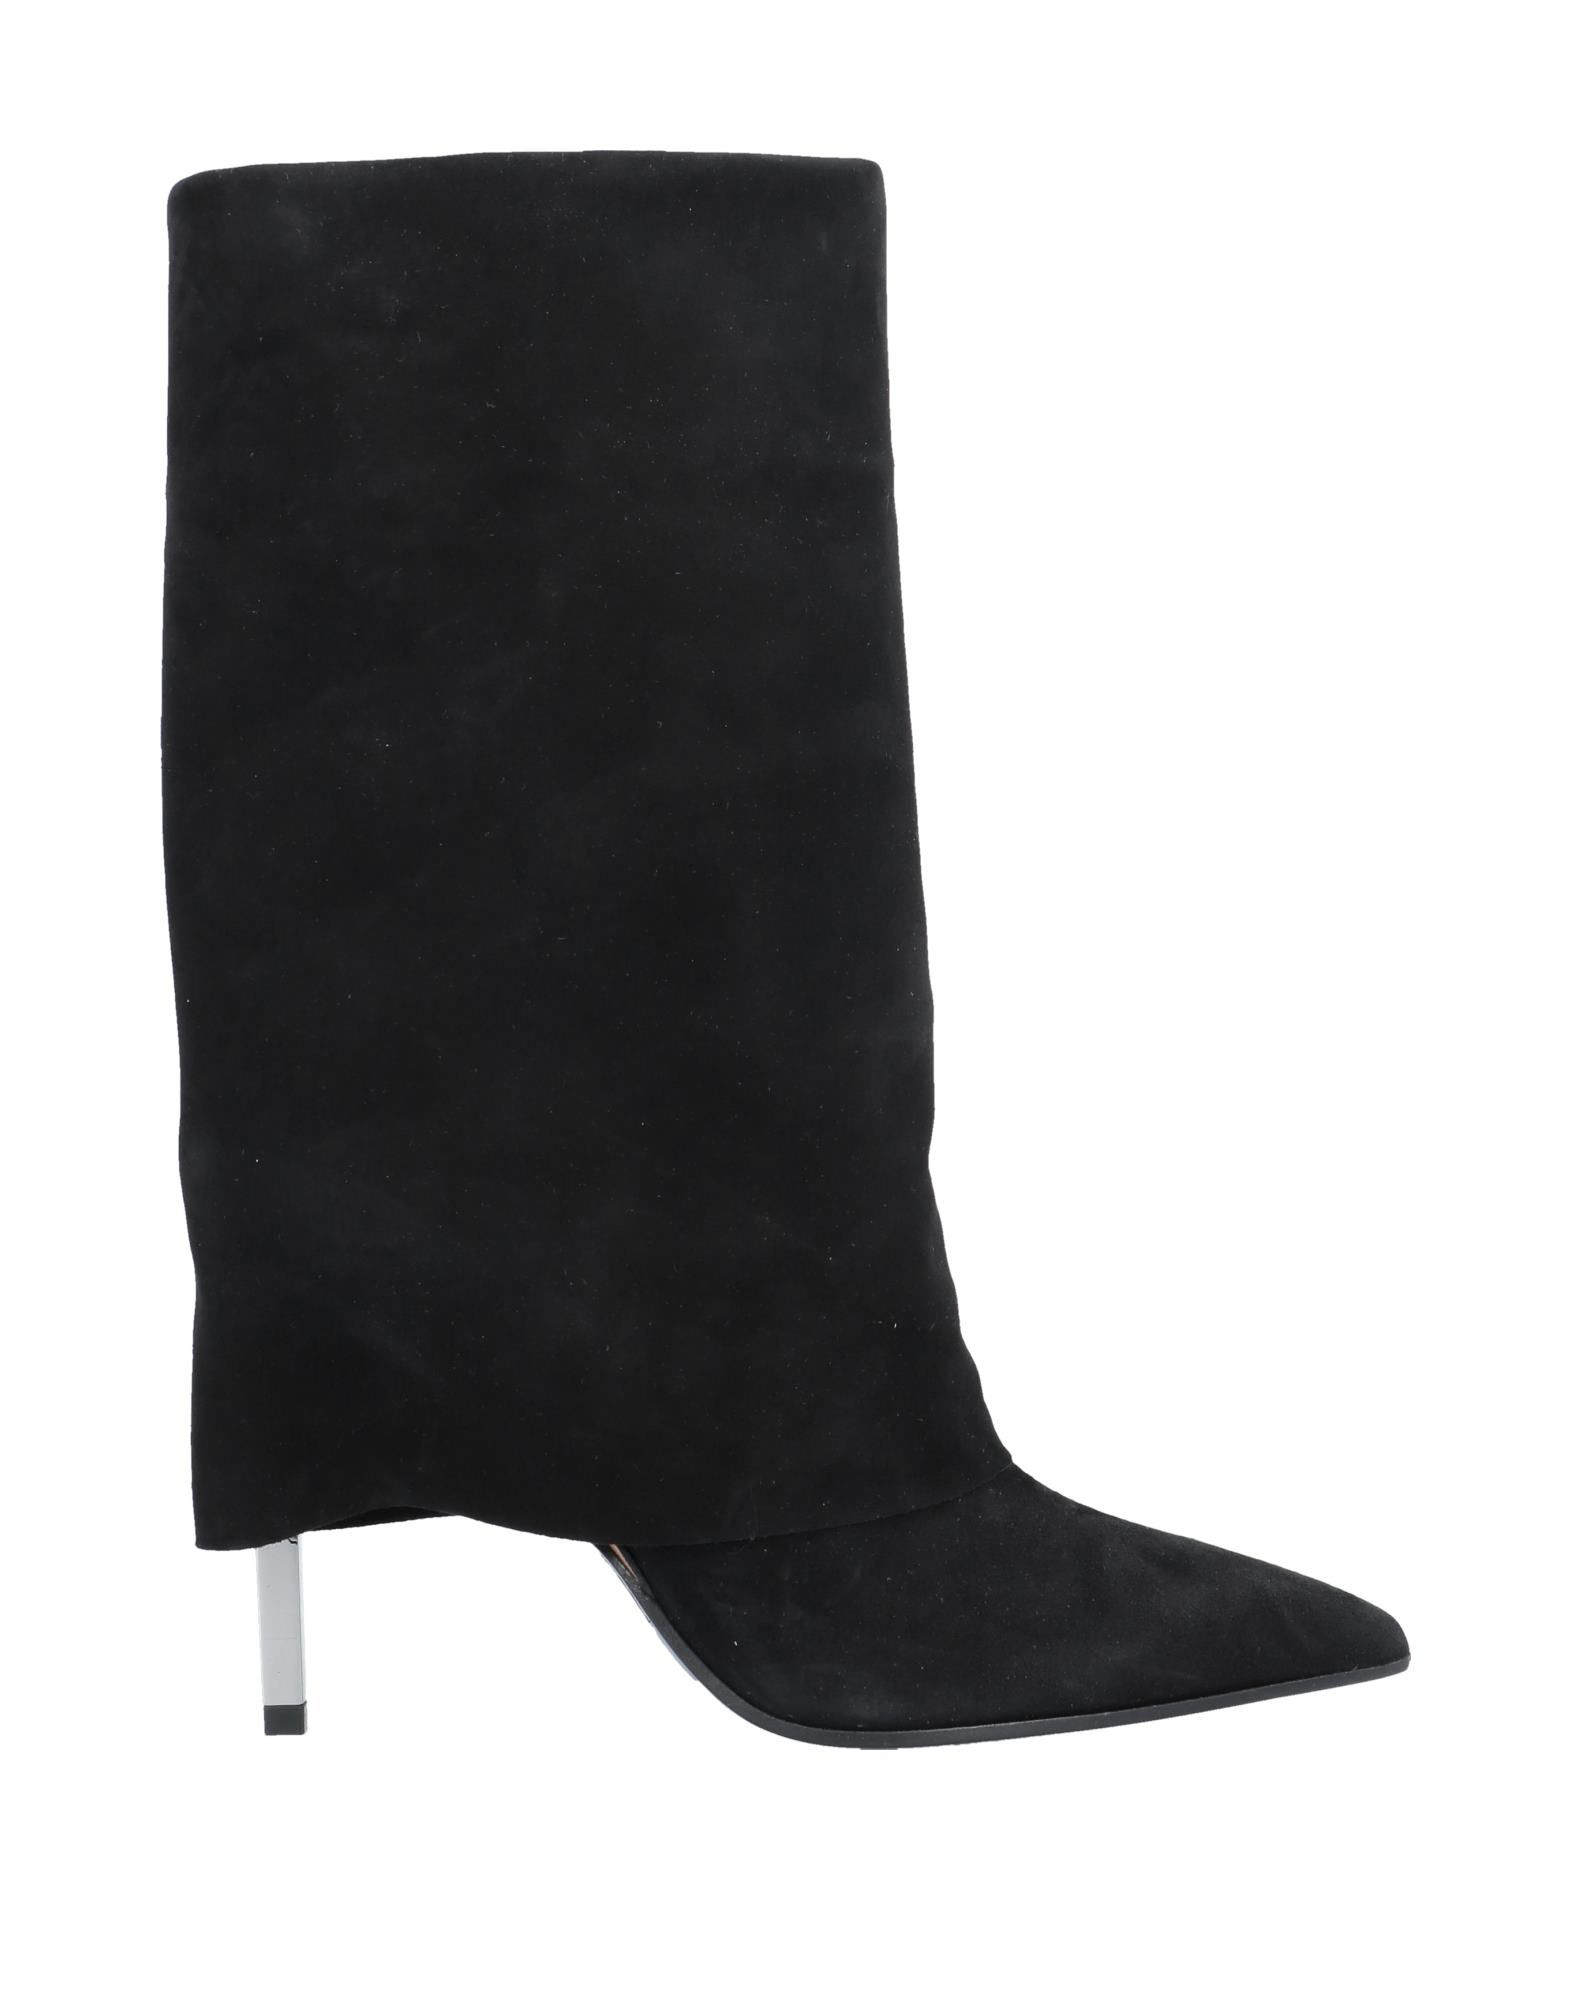 BALMAIN Ankle boot,11654560BT 8